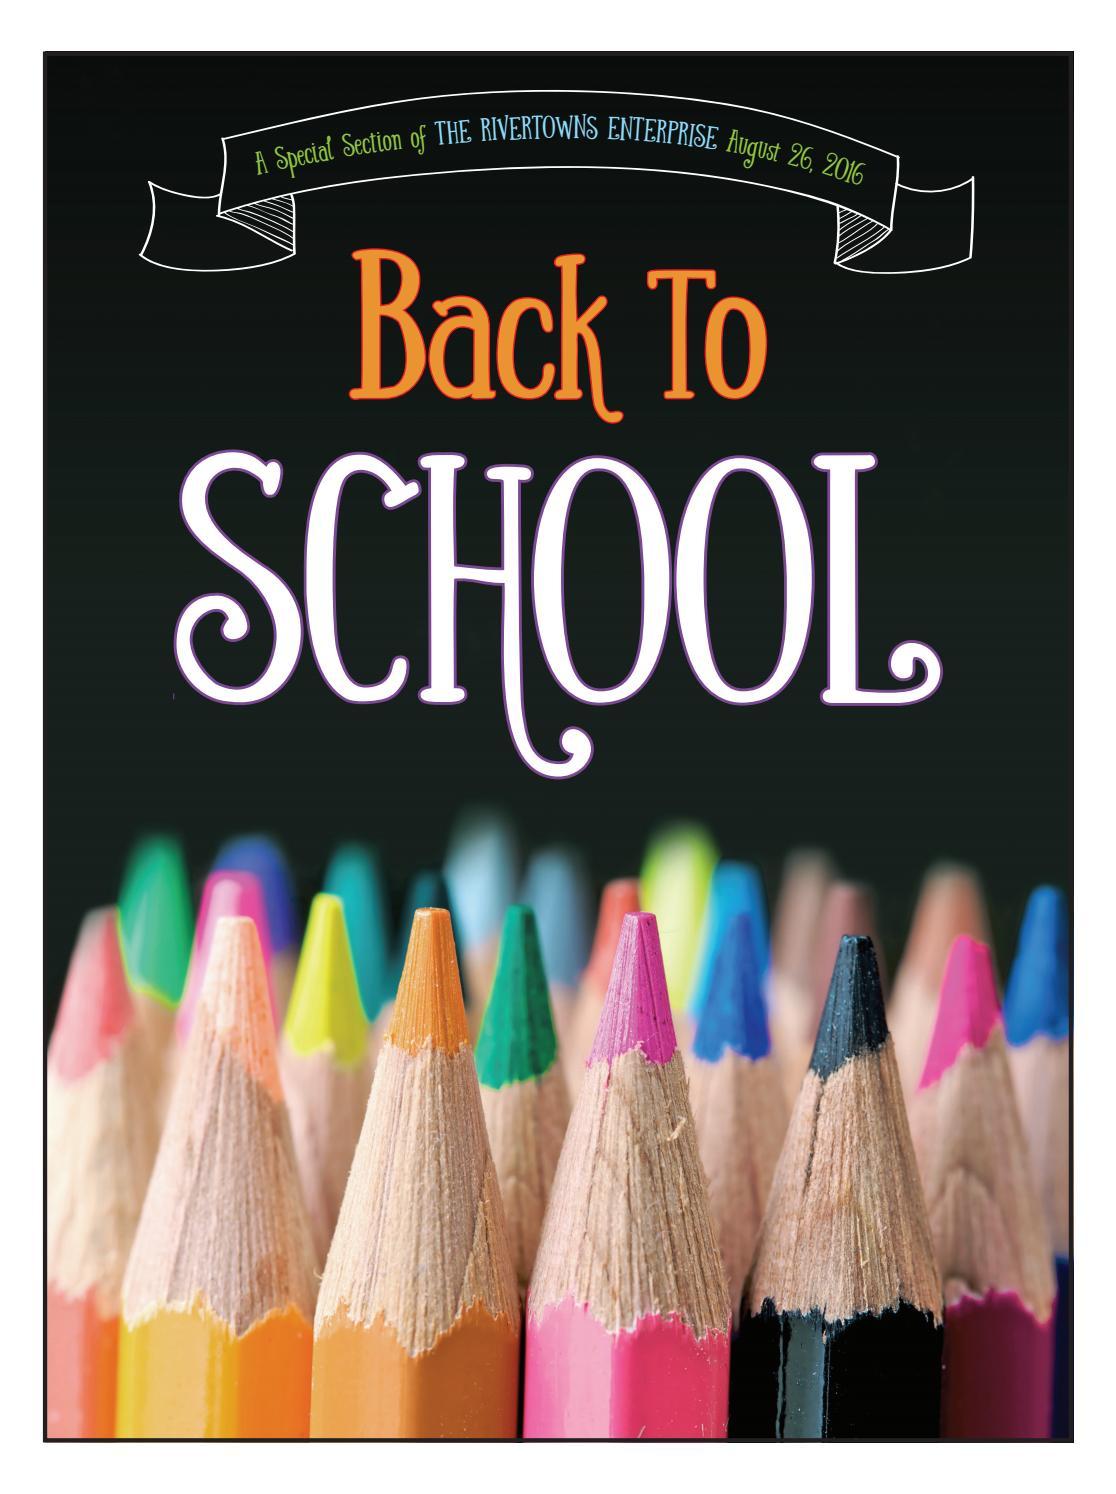 Lot of 100 Misprint 2-Year 2011 /& 2012 Calendar Pens